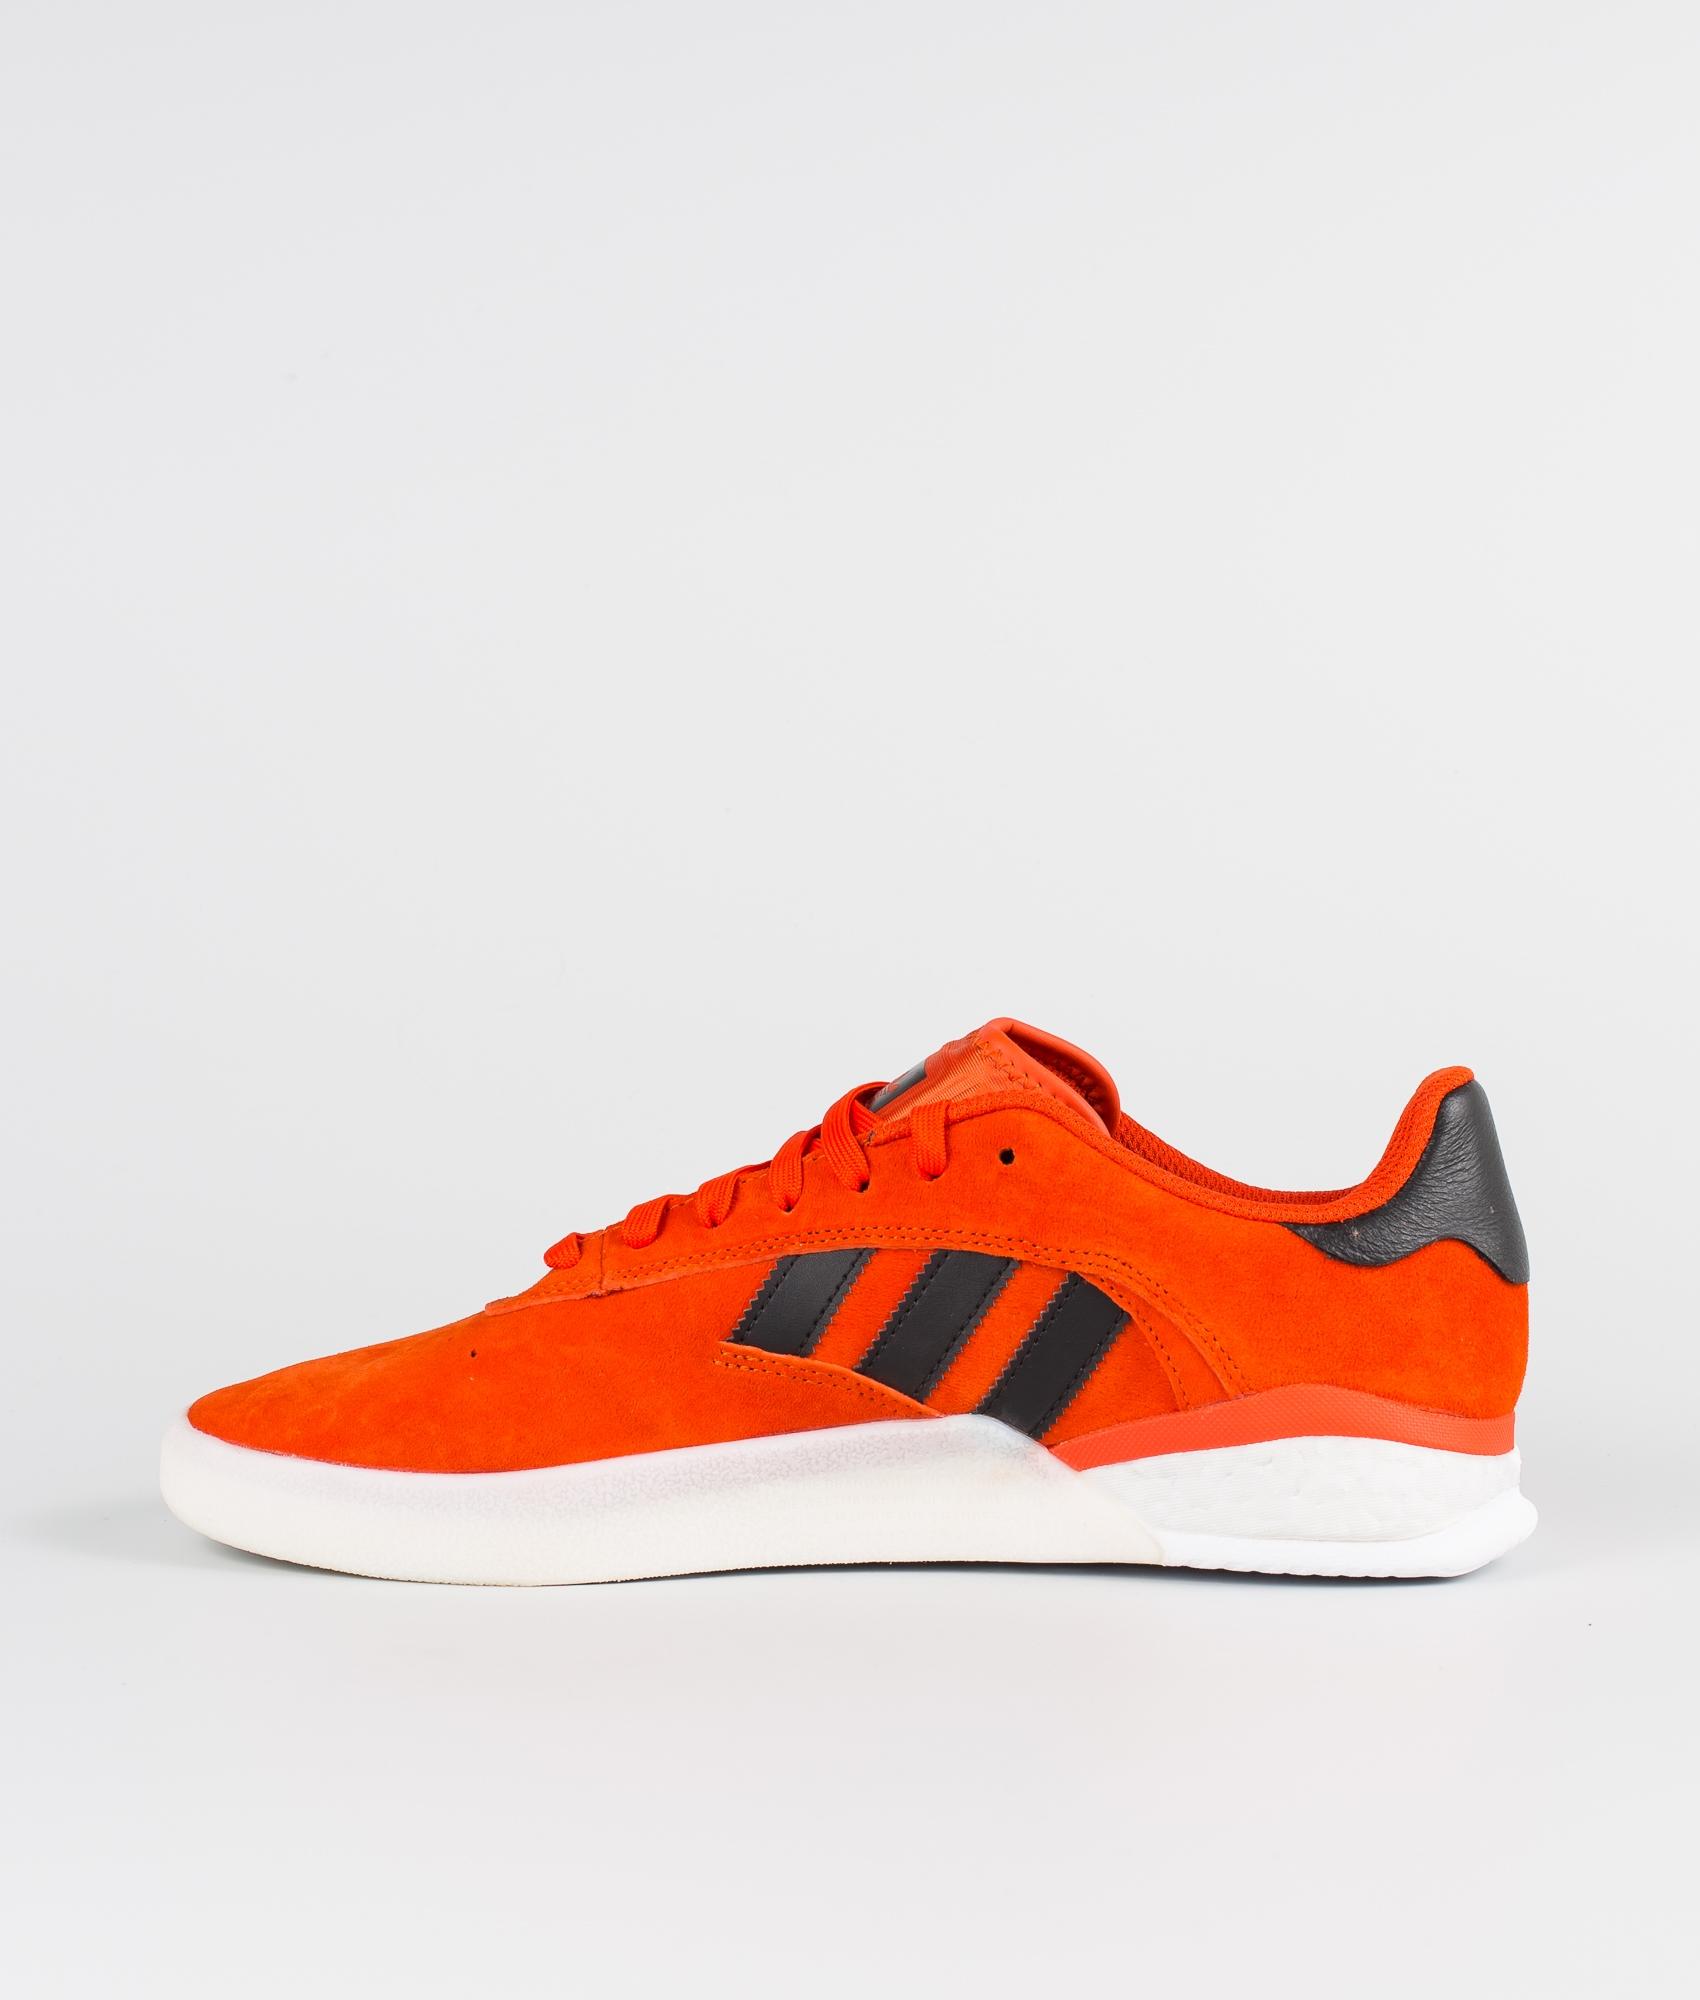 netherlands red adidas skate shoes cd97e 5baa4